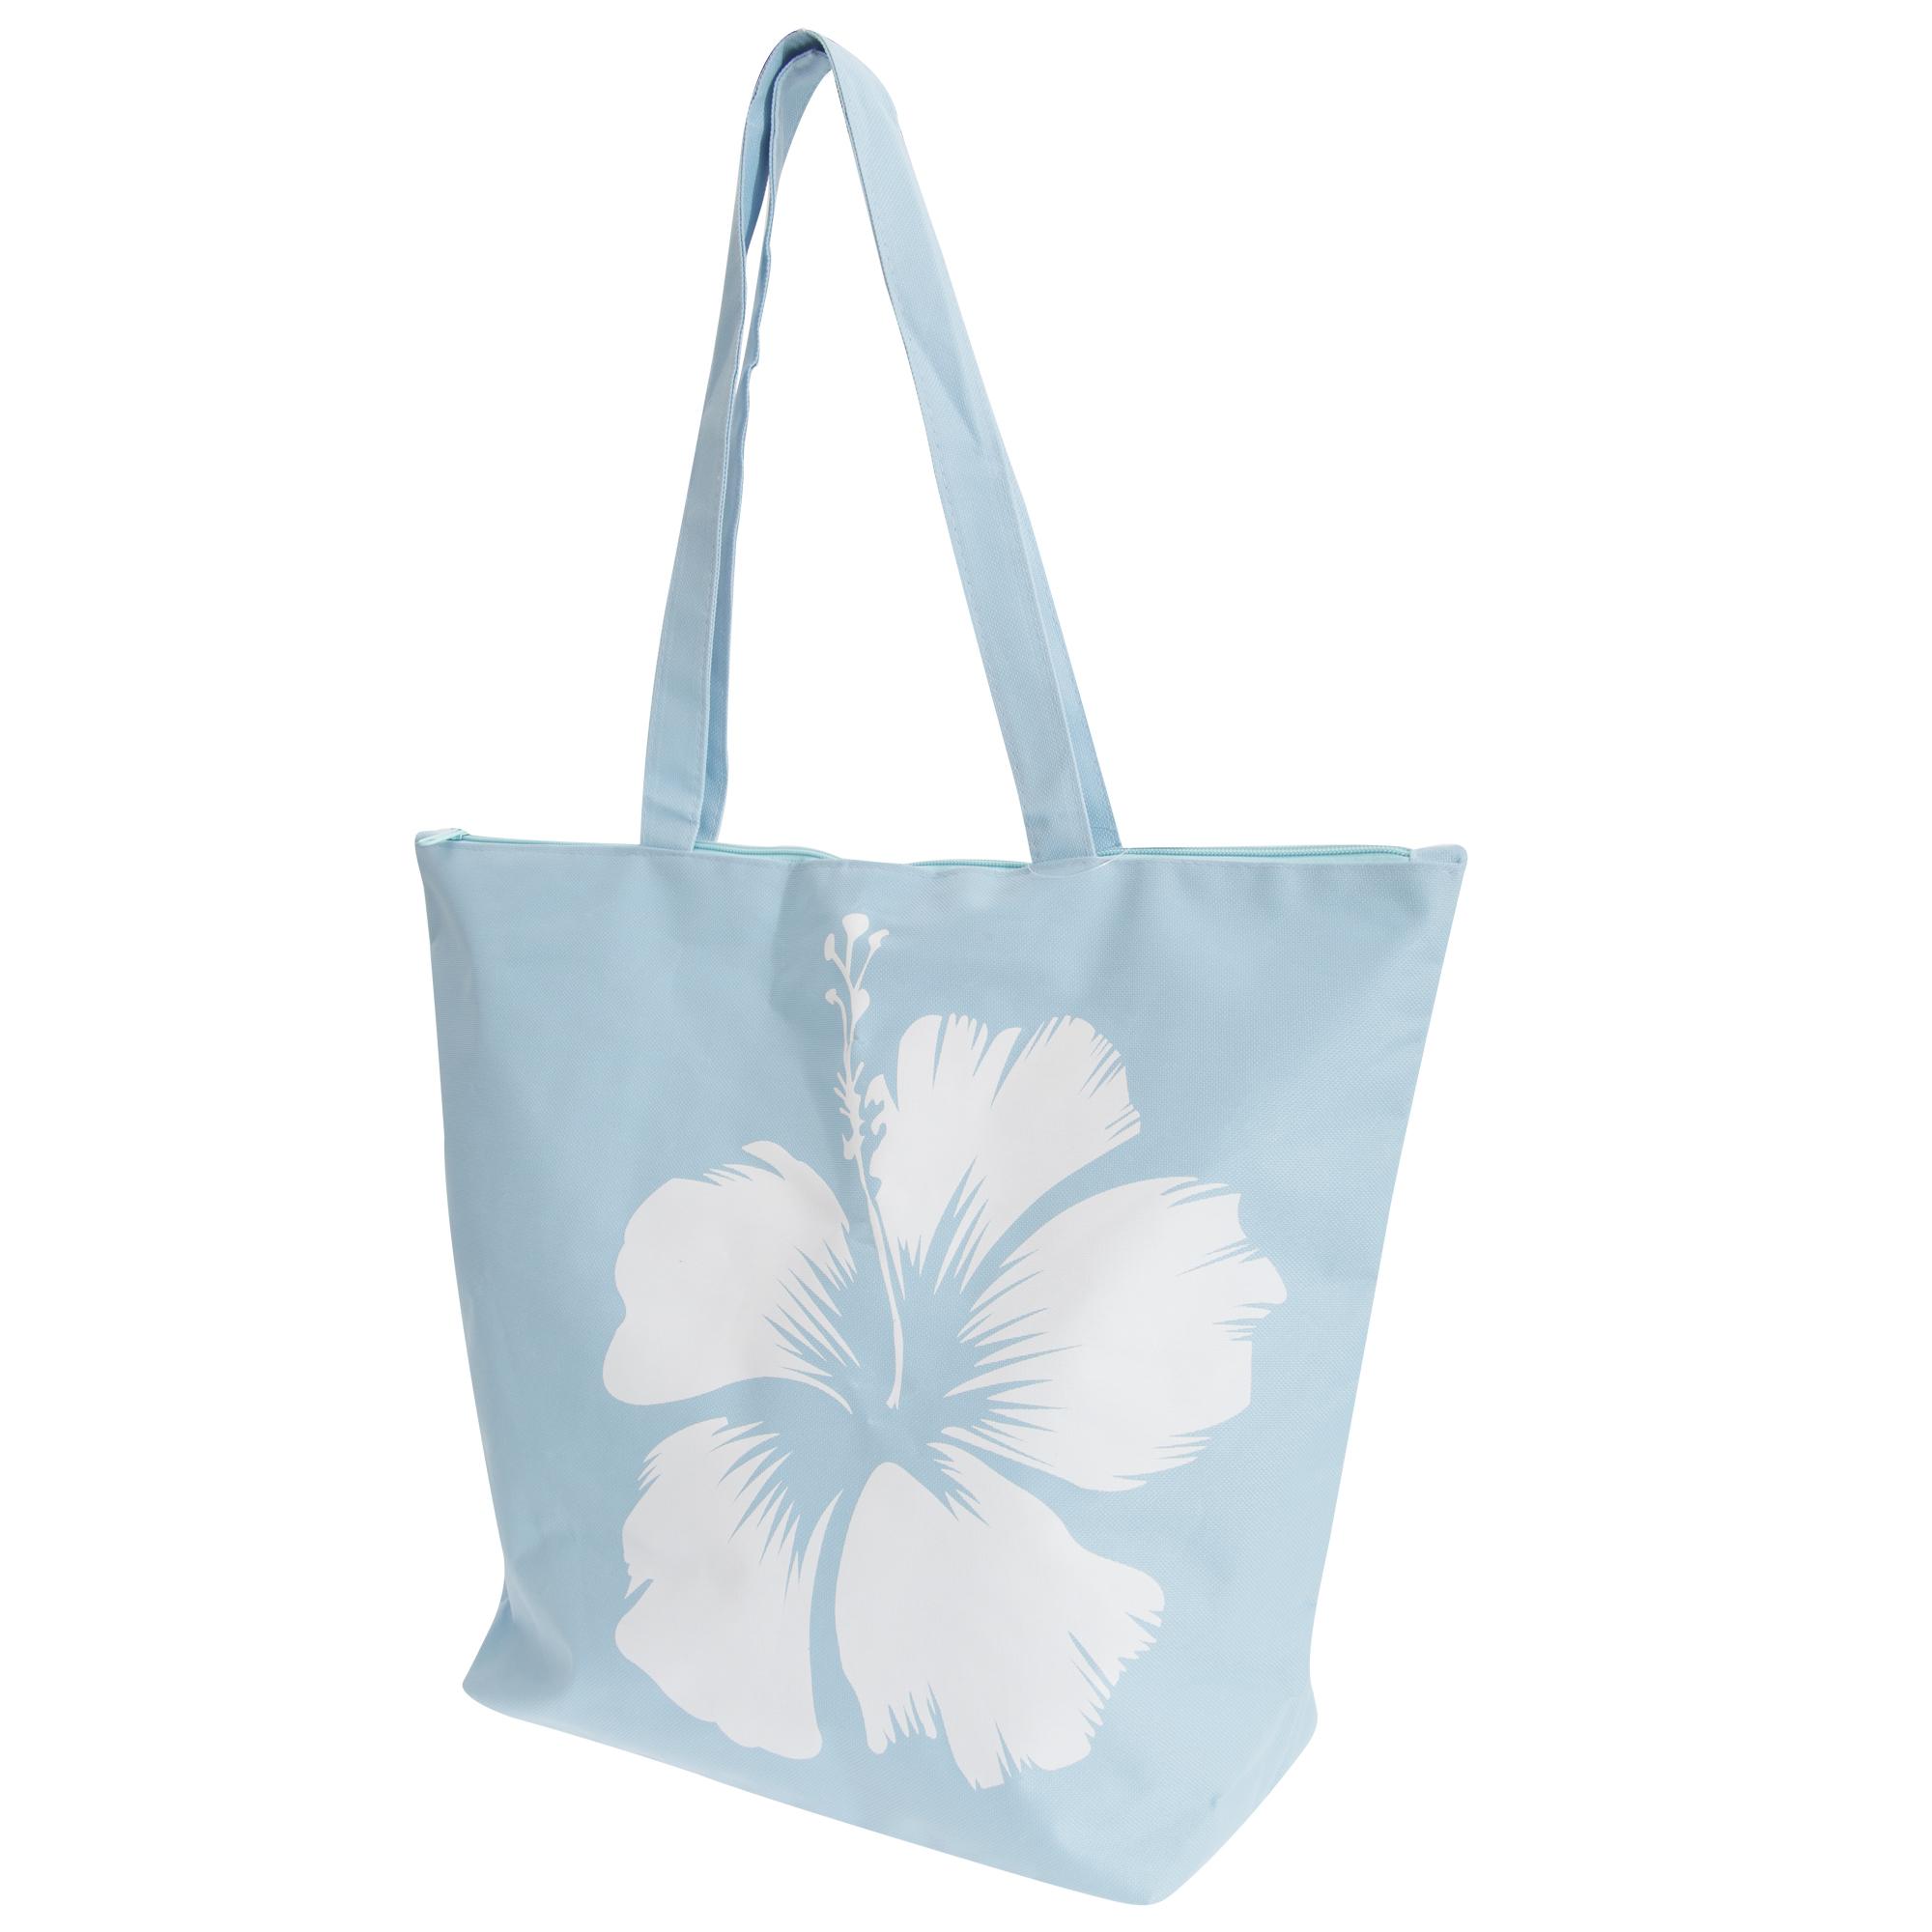 FLOSO Womens/Ladies Hawaiian Flower Summer Handbag (One Size) (Blue)